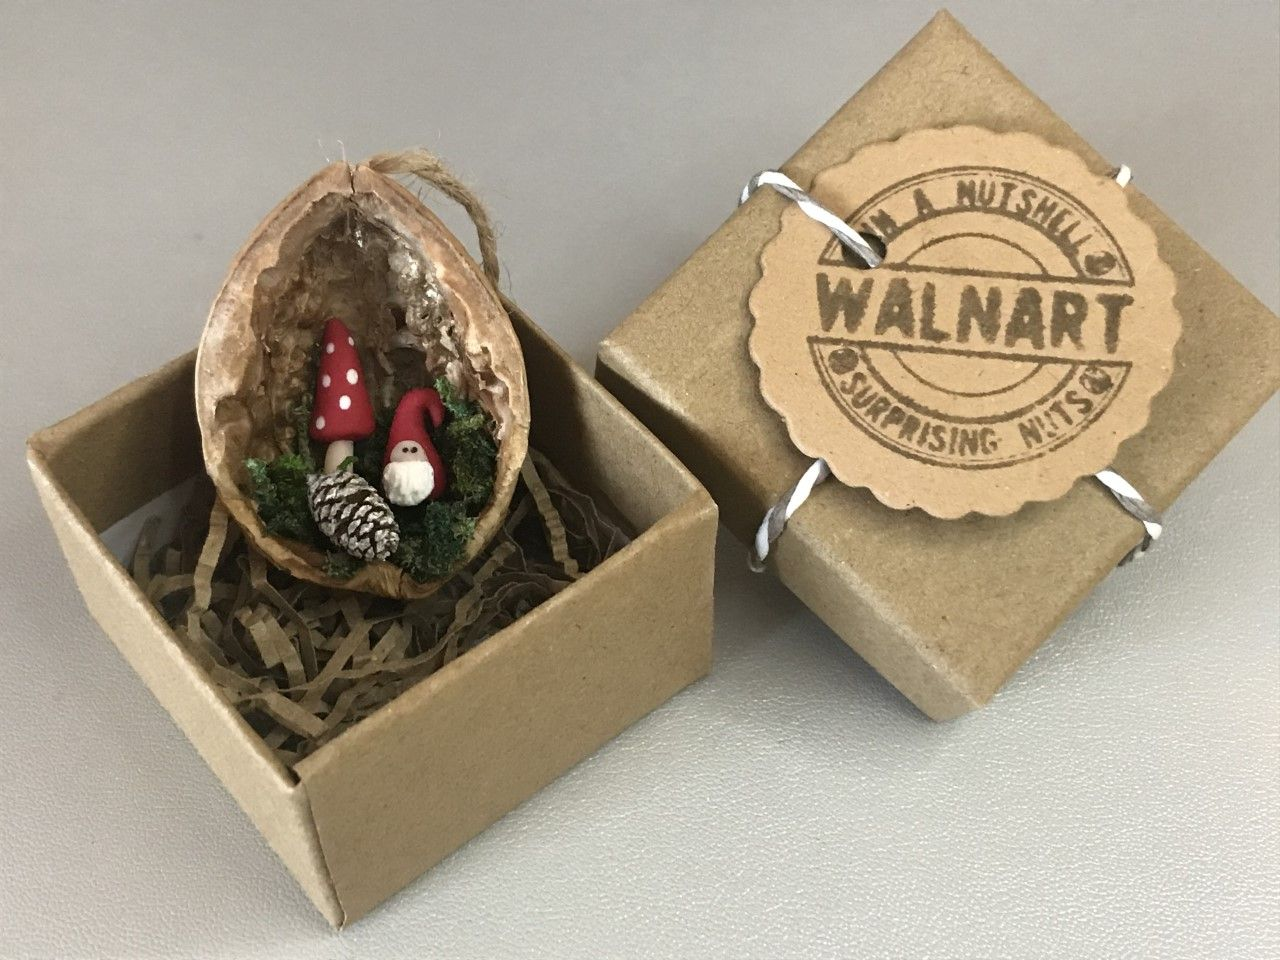 Walter, the original walnart gnome